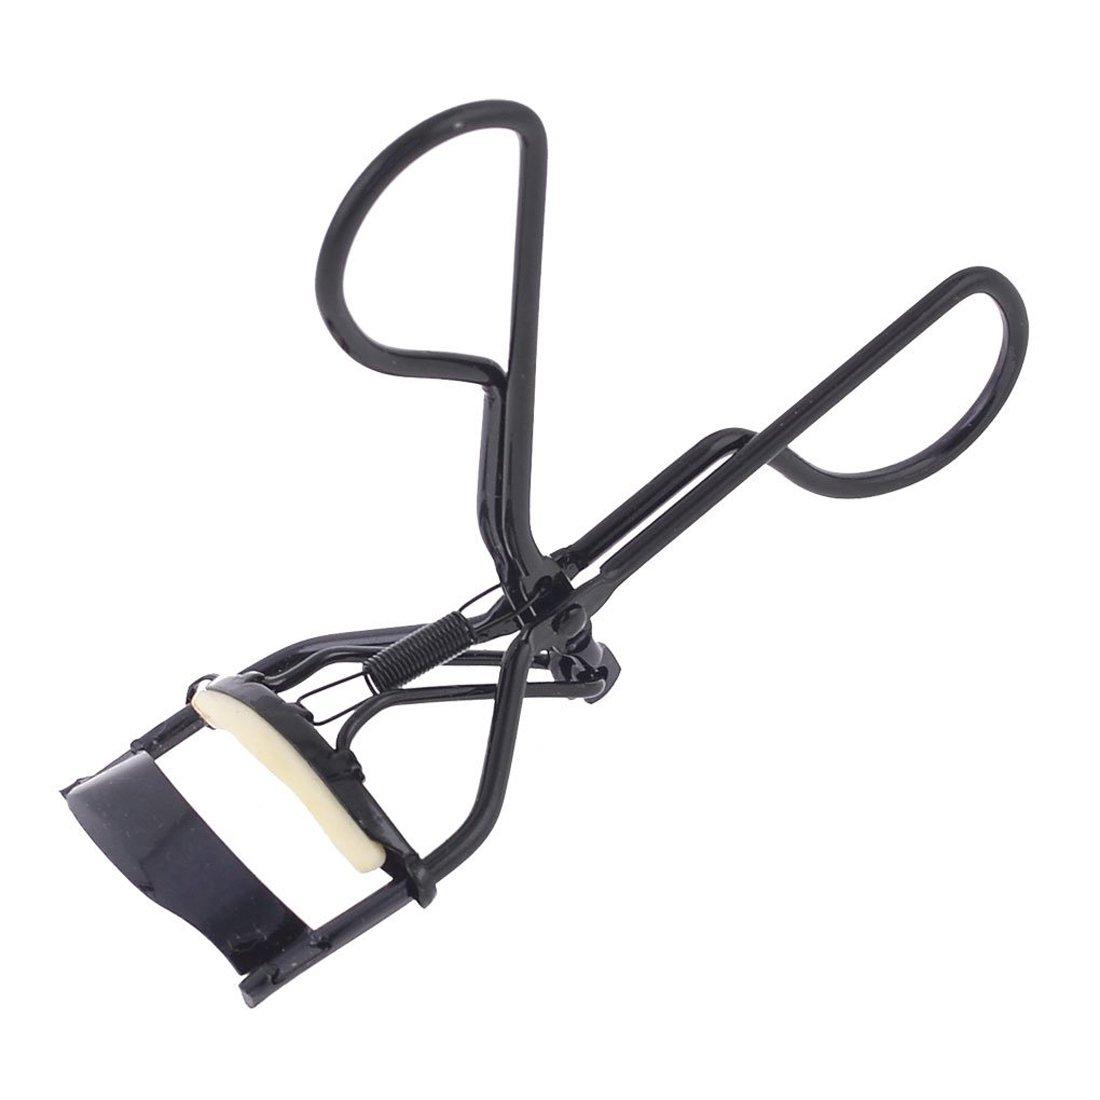 SODIAL Cosmetic Tool Black Handgrip Curling Lashes Eyelash Curler